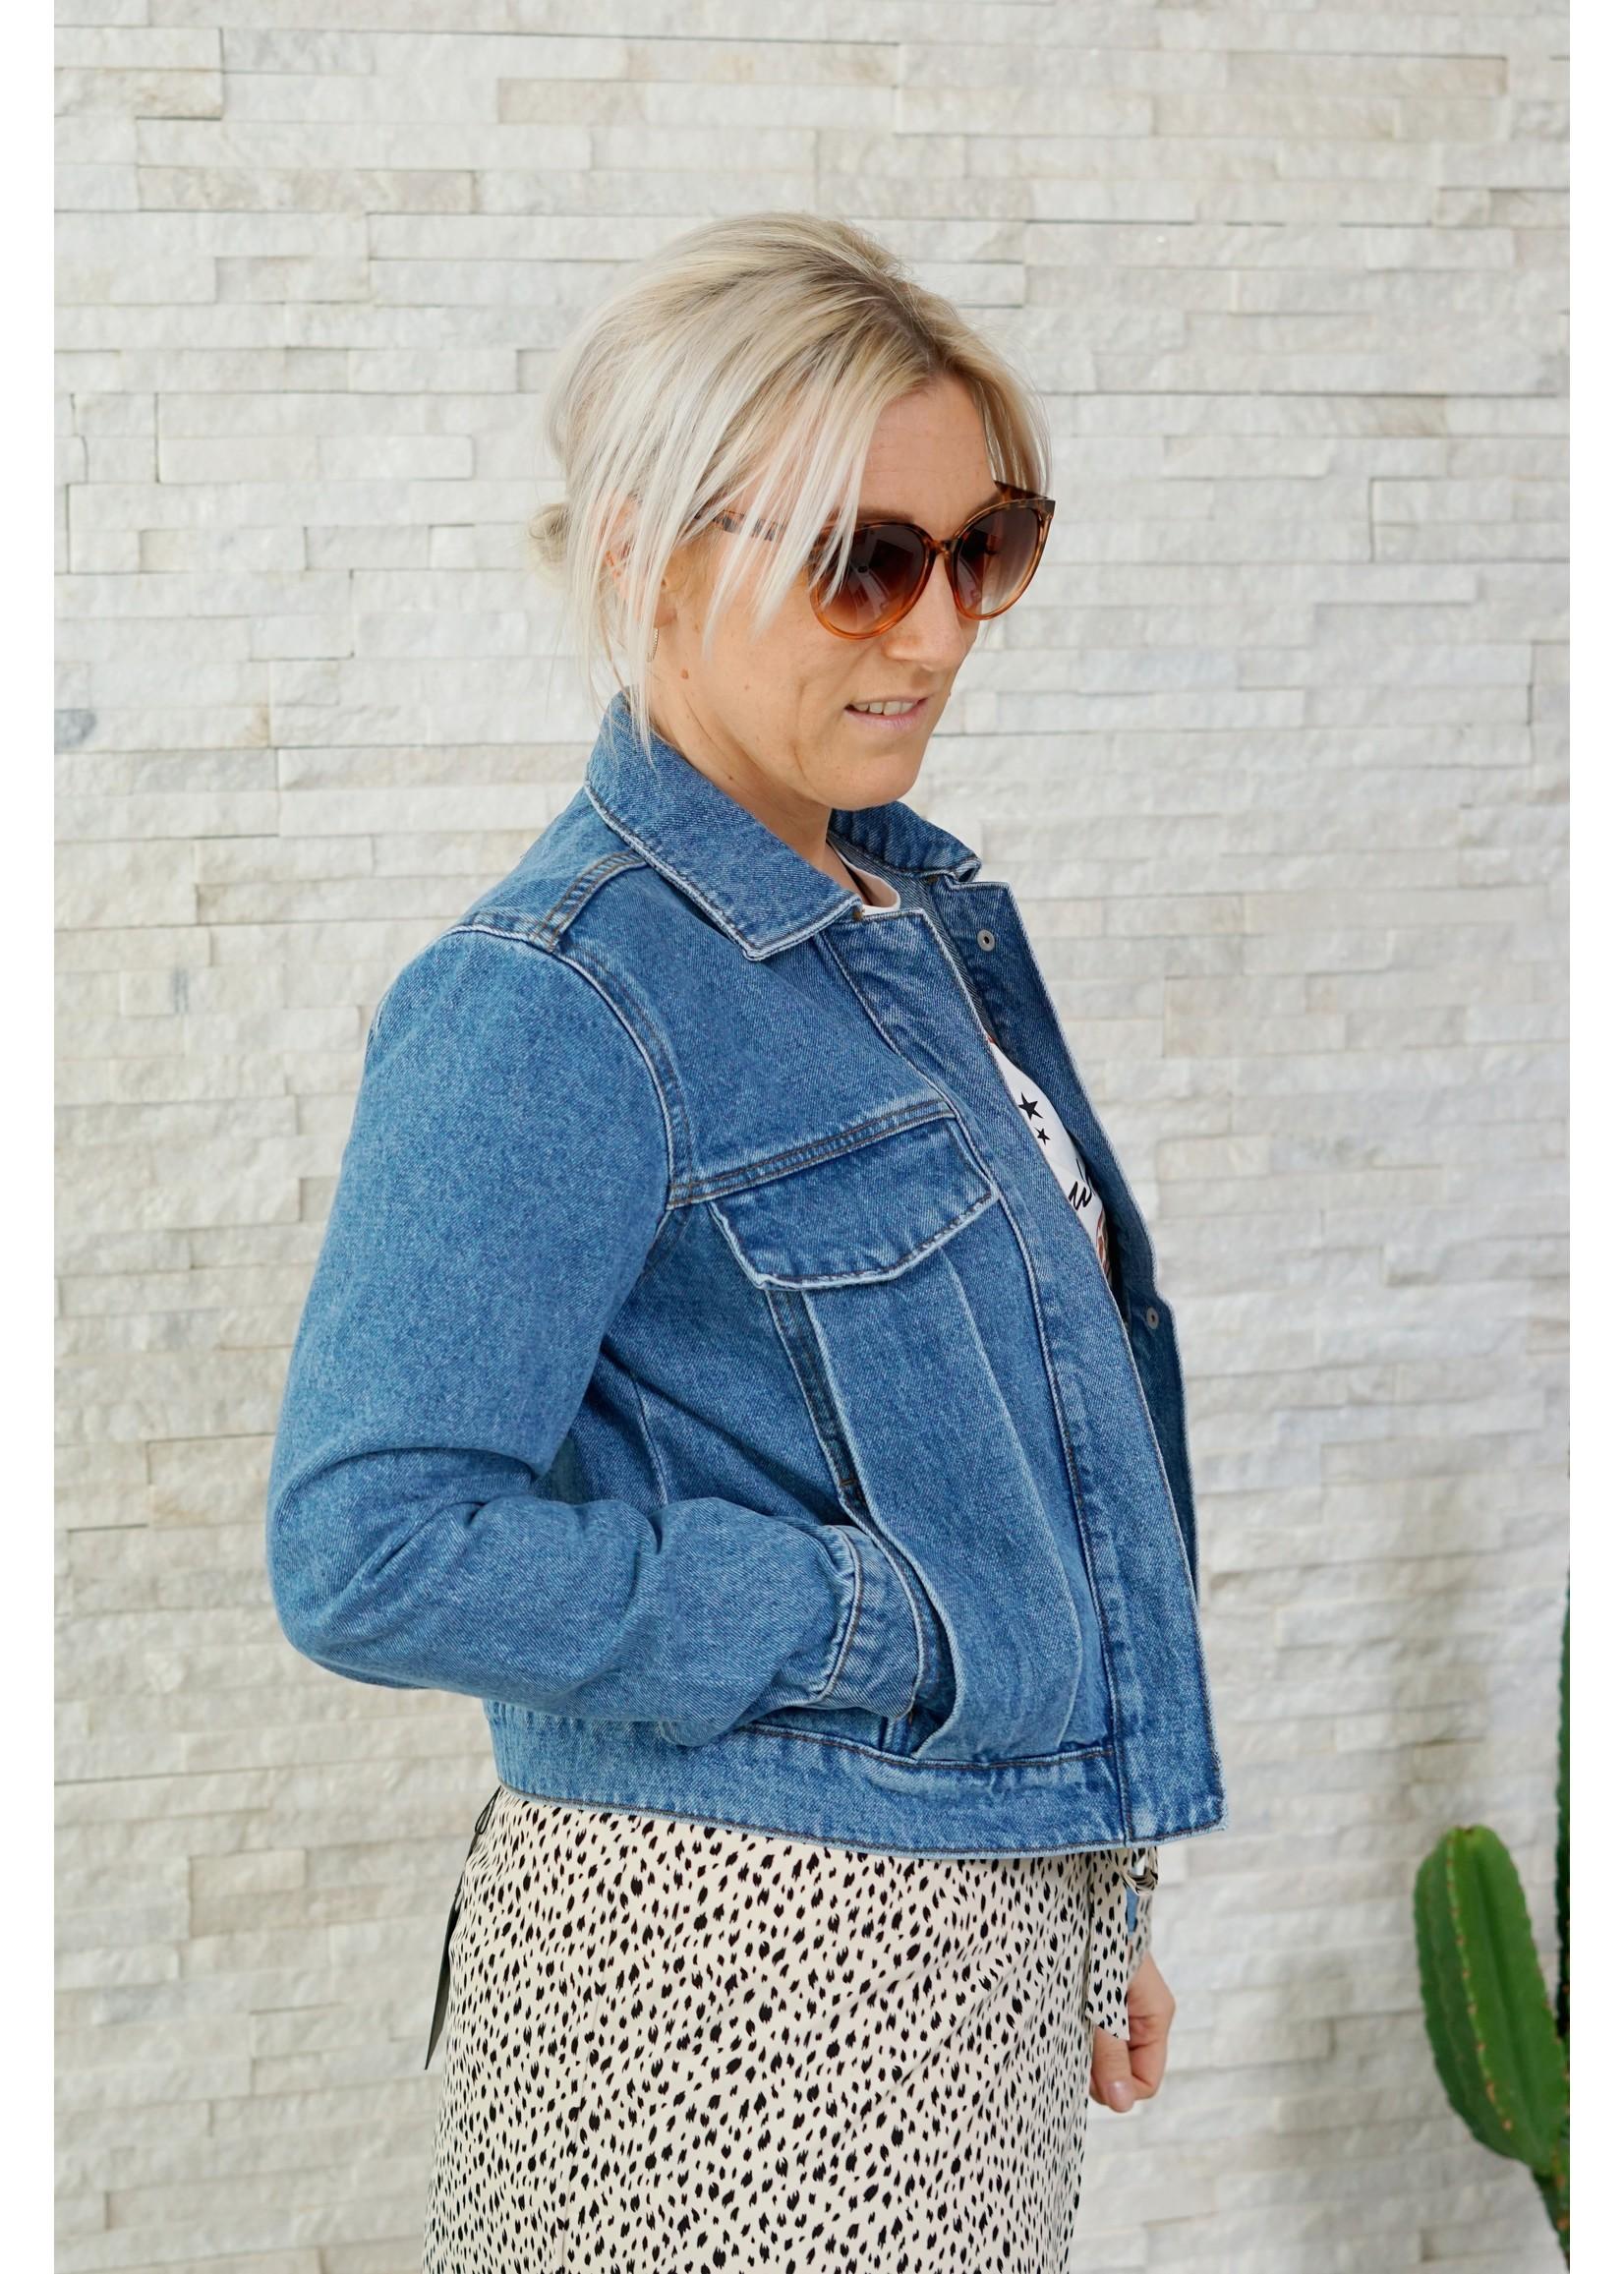 Perfect jeansjacket